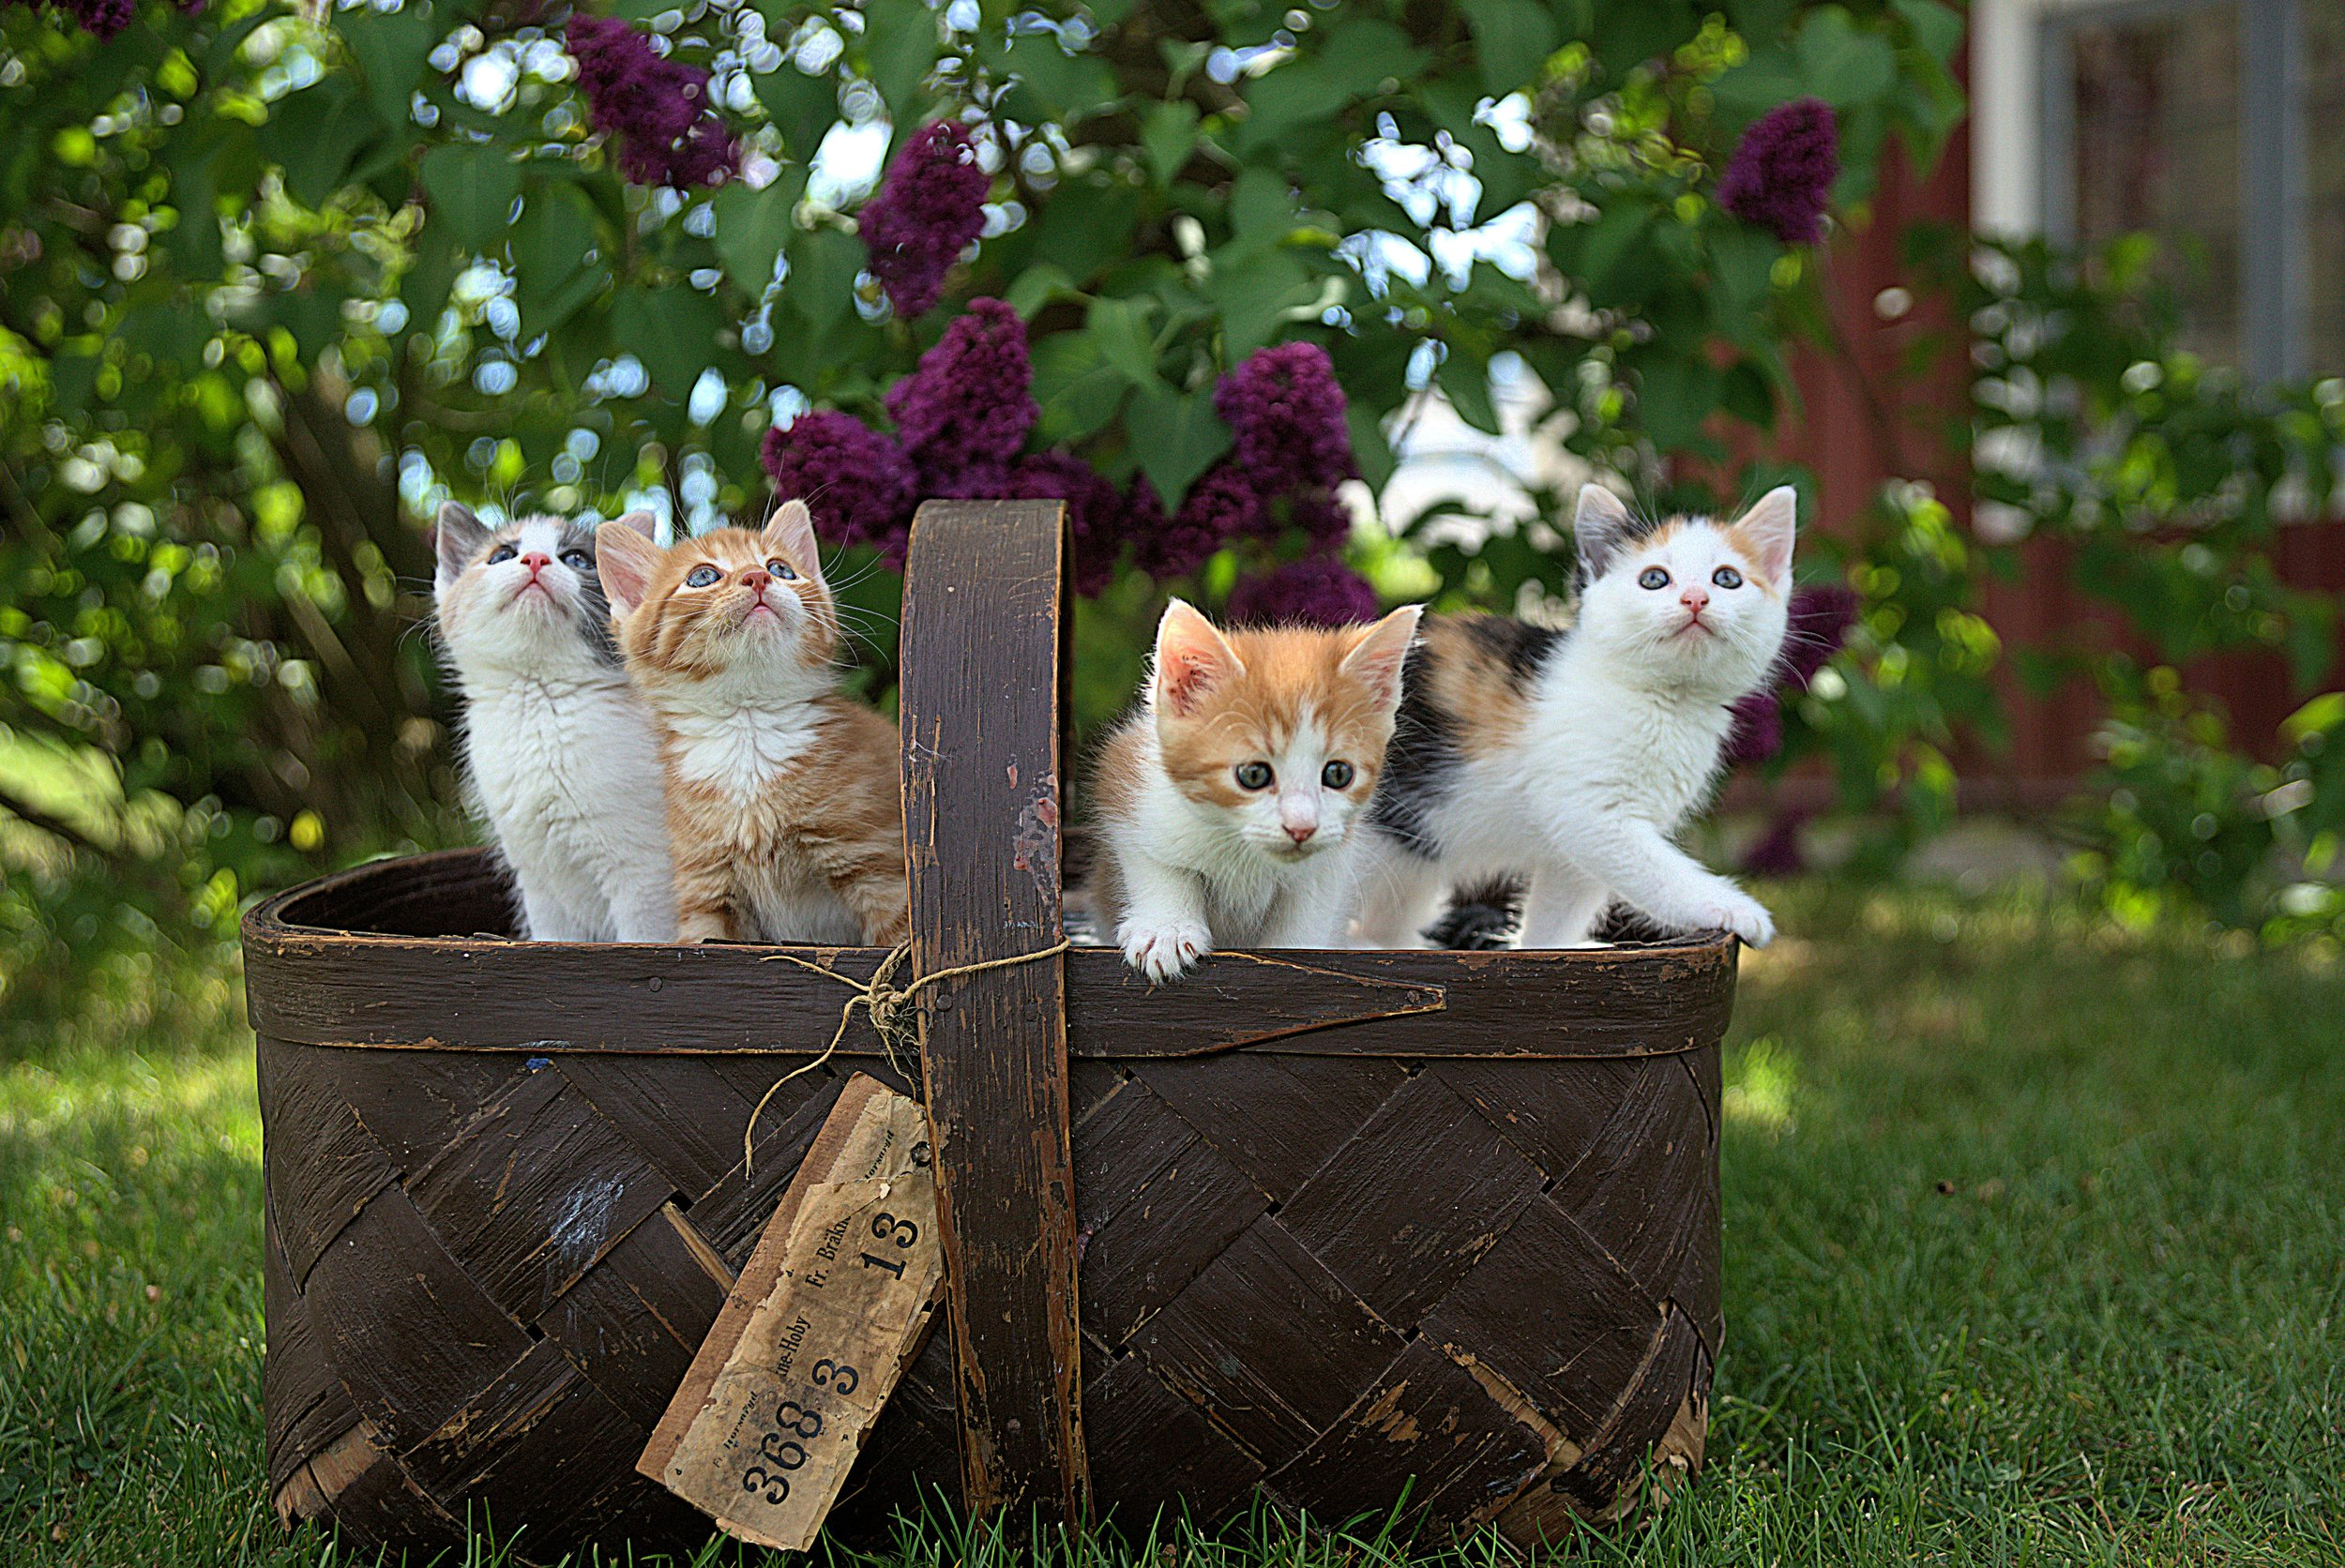 workwithme_kittens-in-basket_jari-hytonen-538885-unsplash.jpg